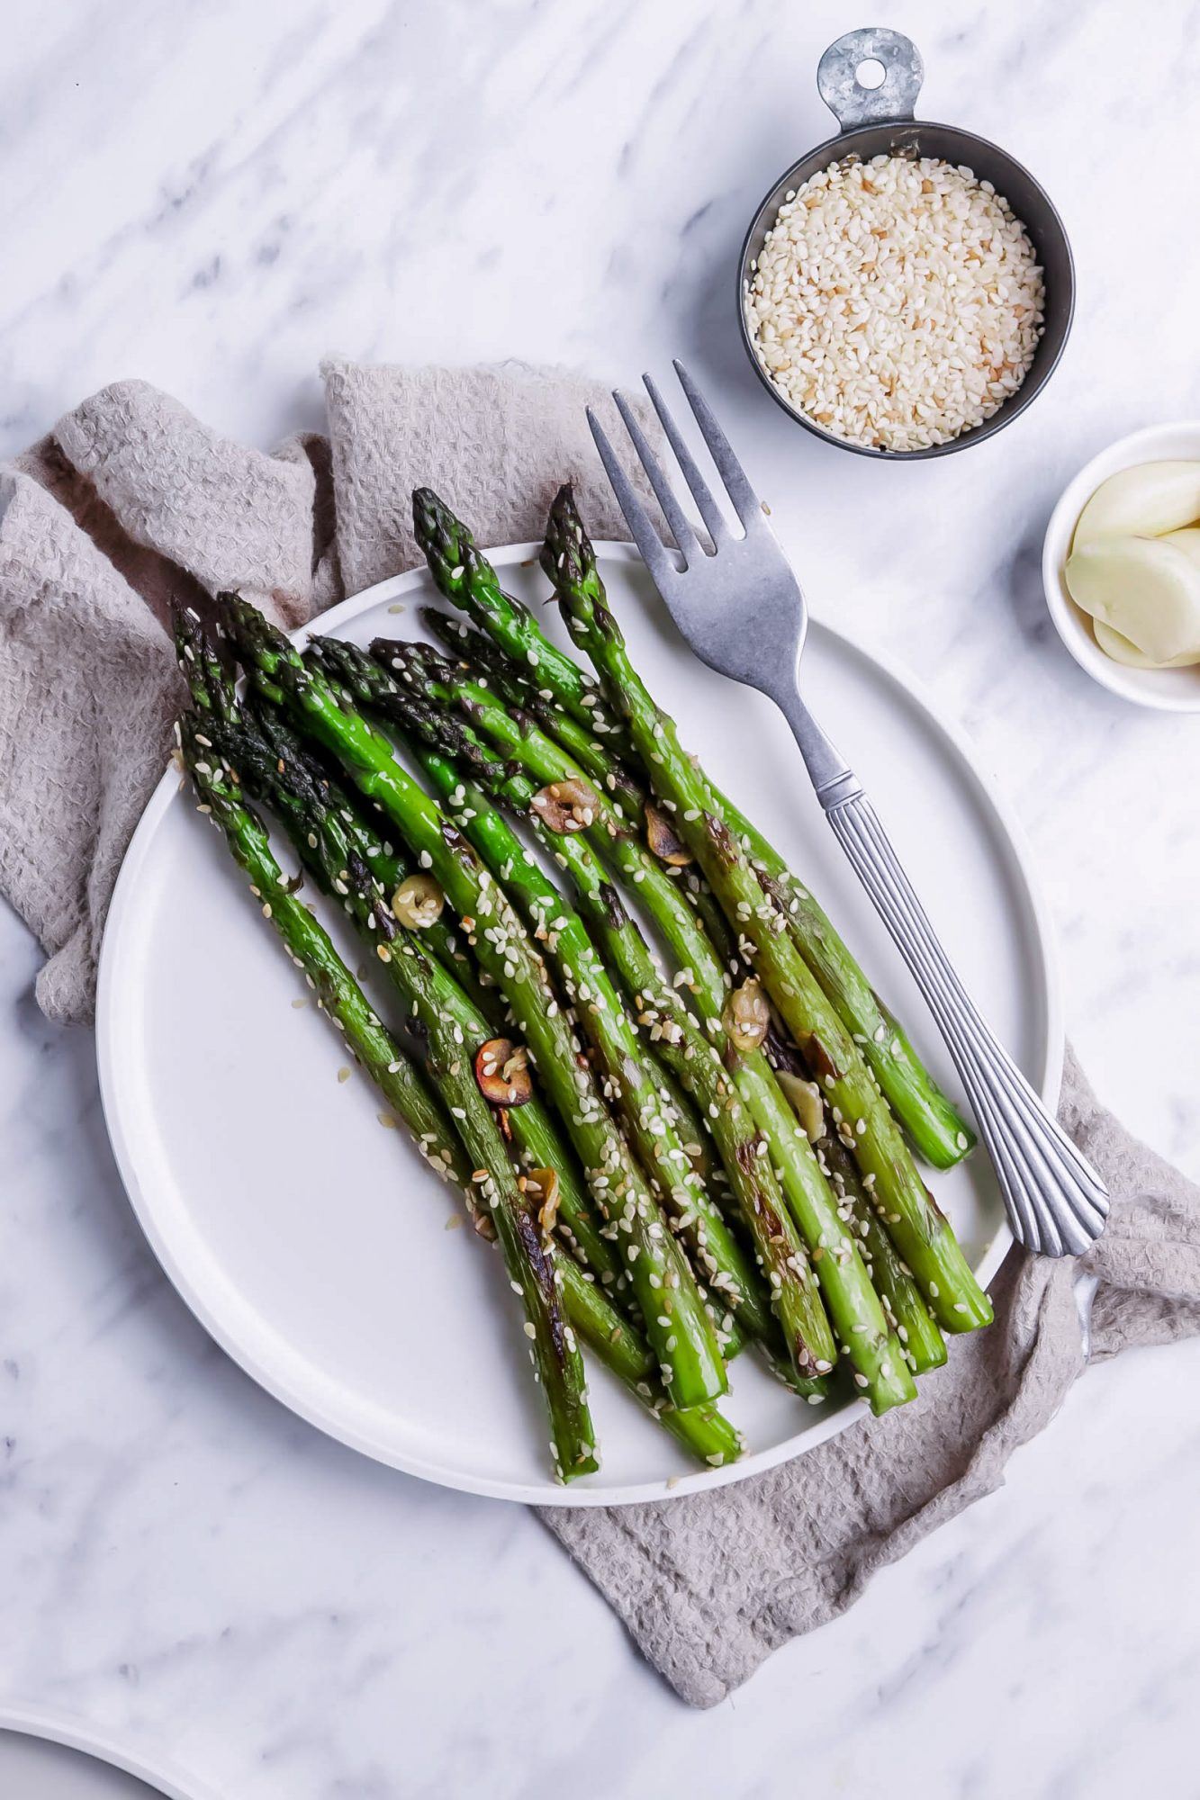 Garlic Skillet Asparagus